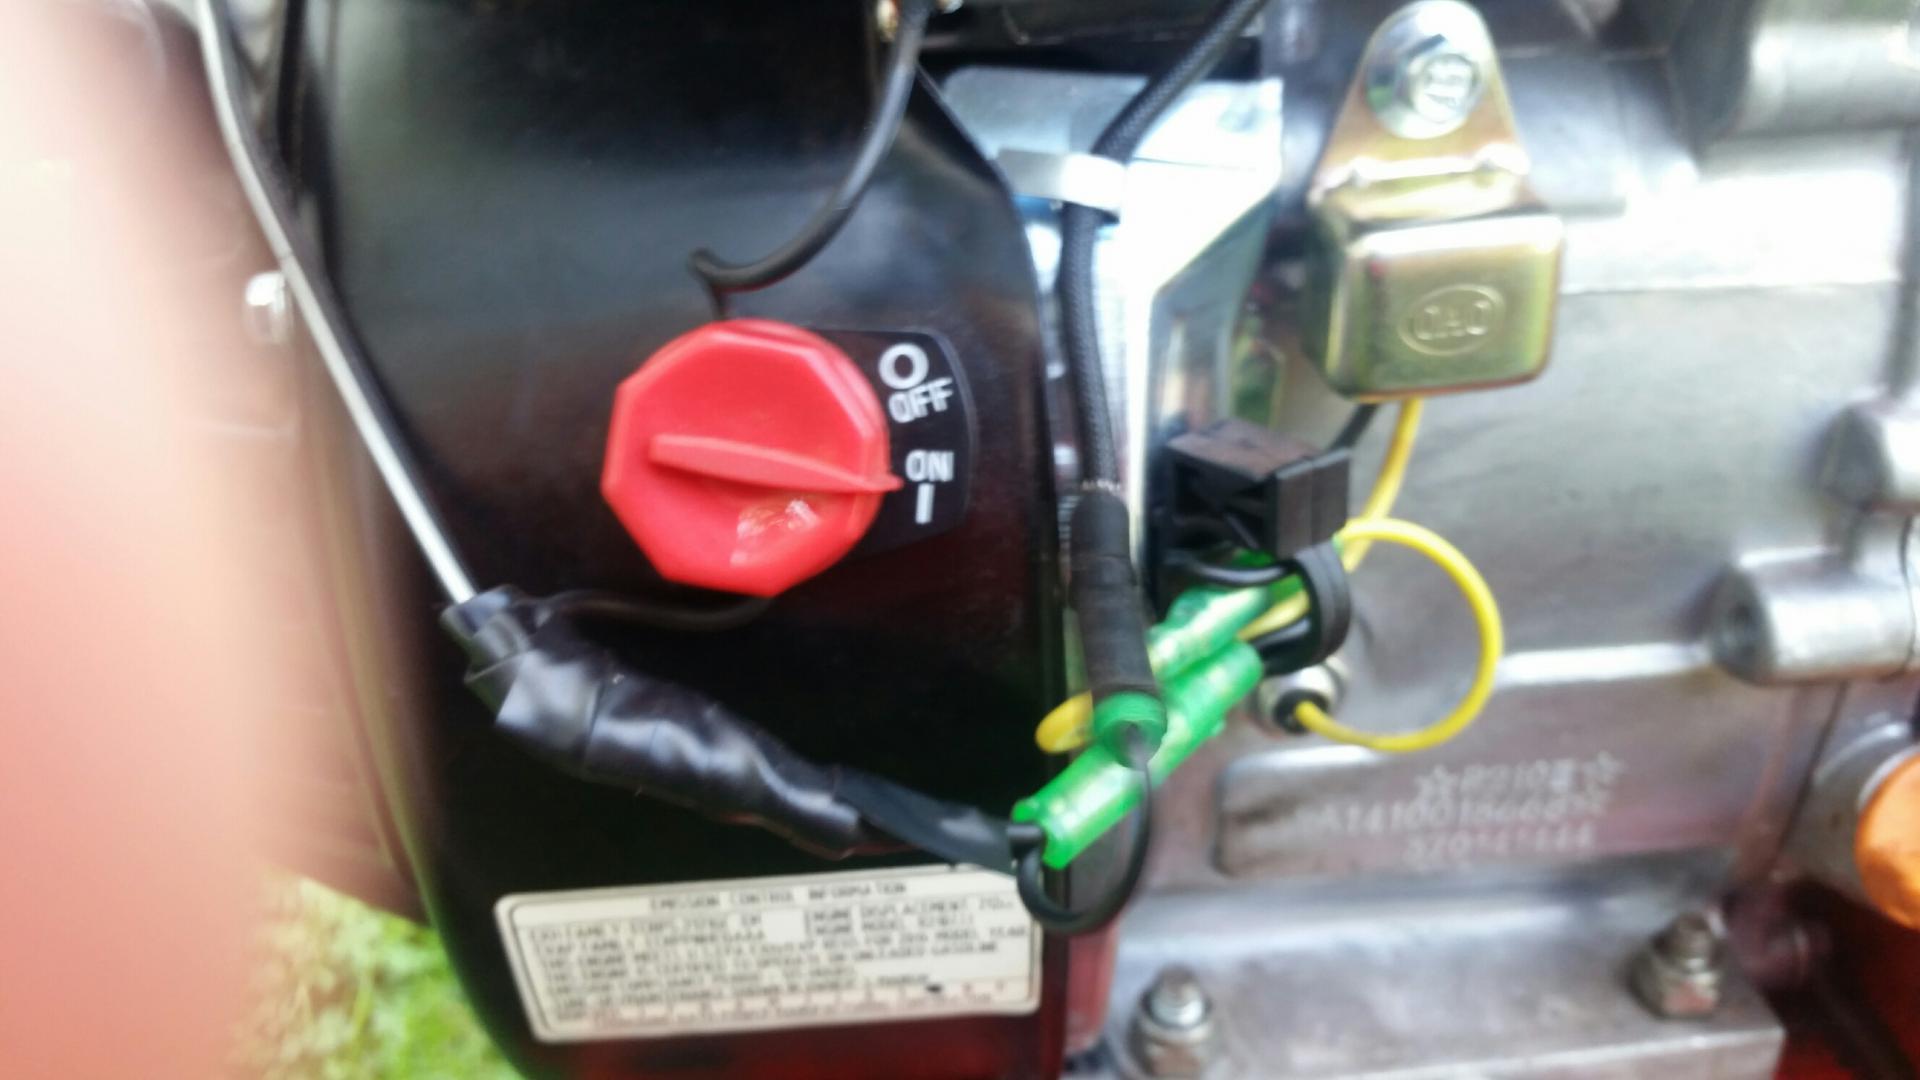 Toro 421, Predator engine swap?-20150913_163733_resized.jpg